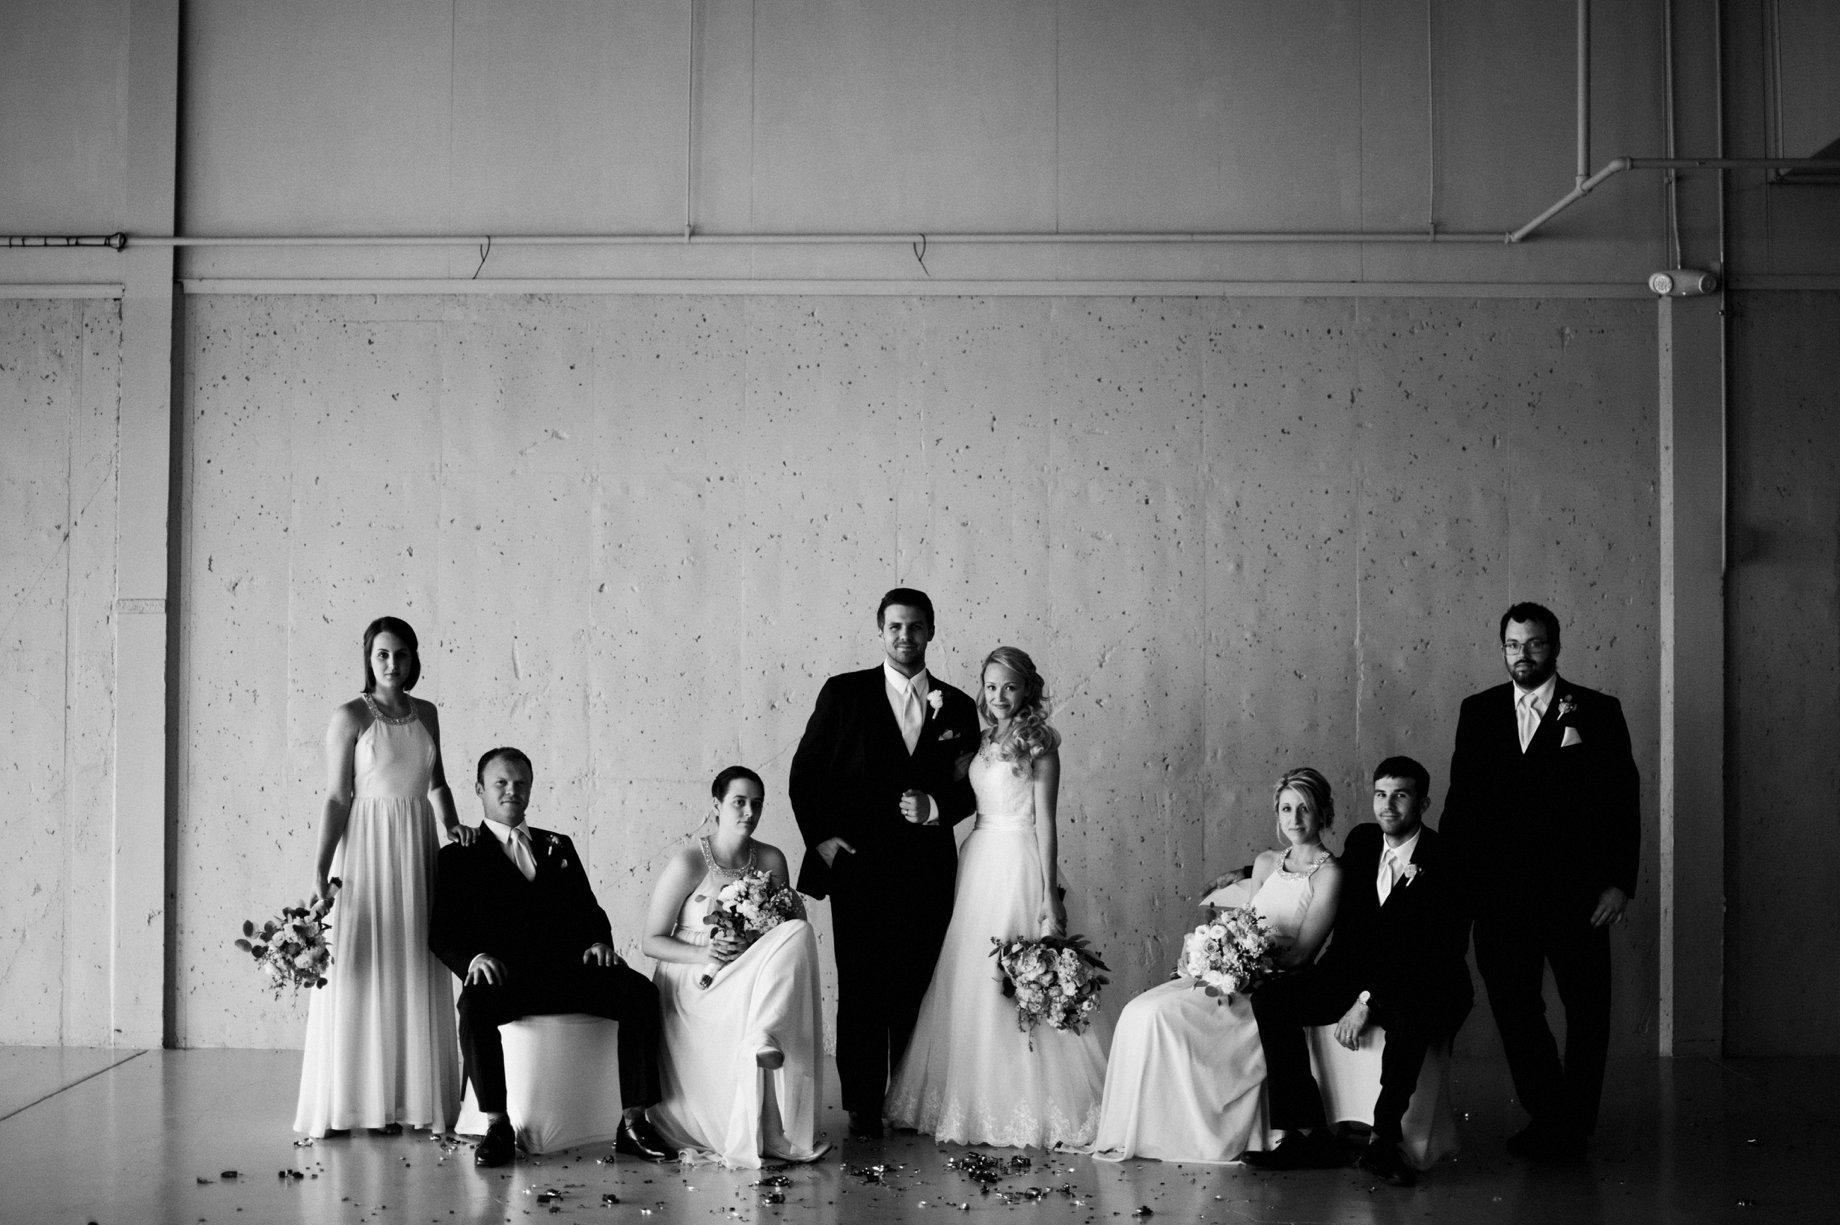 vanity fair style wedding party